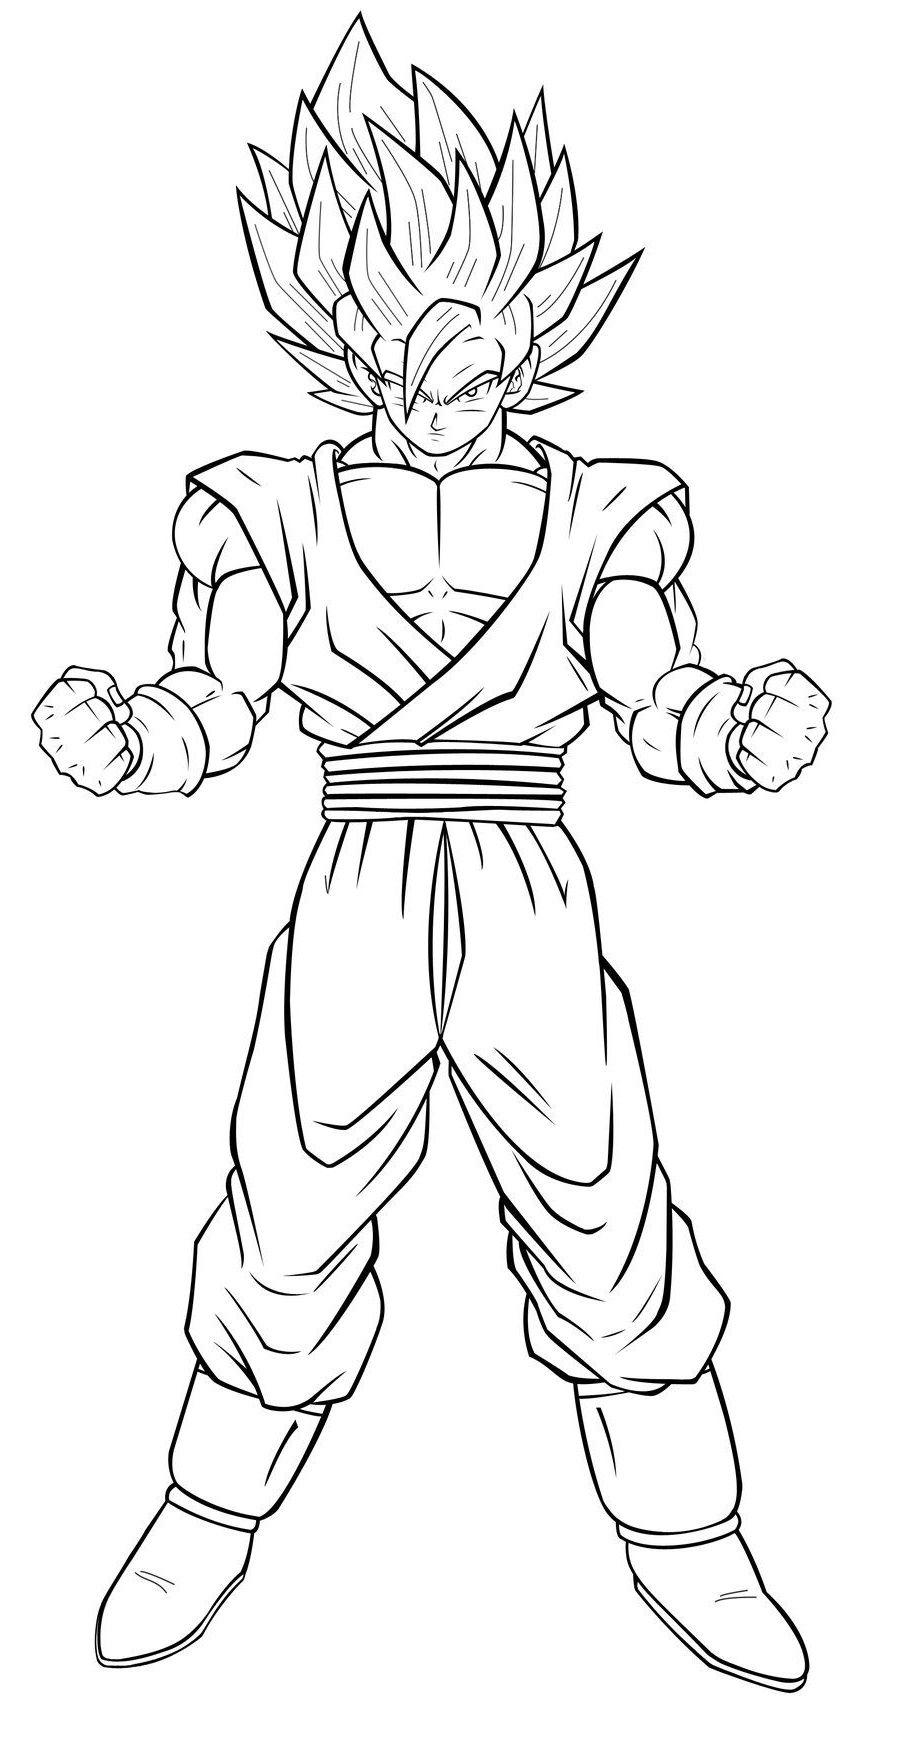 Coloriage Goku Ultra Instinct